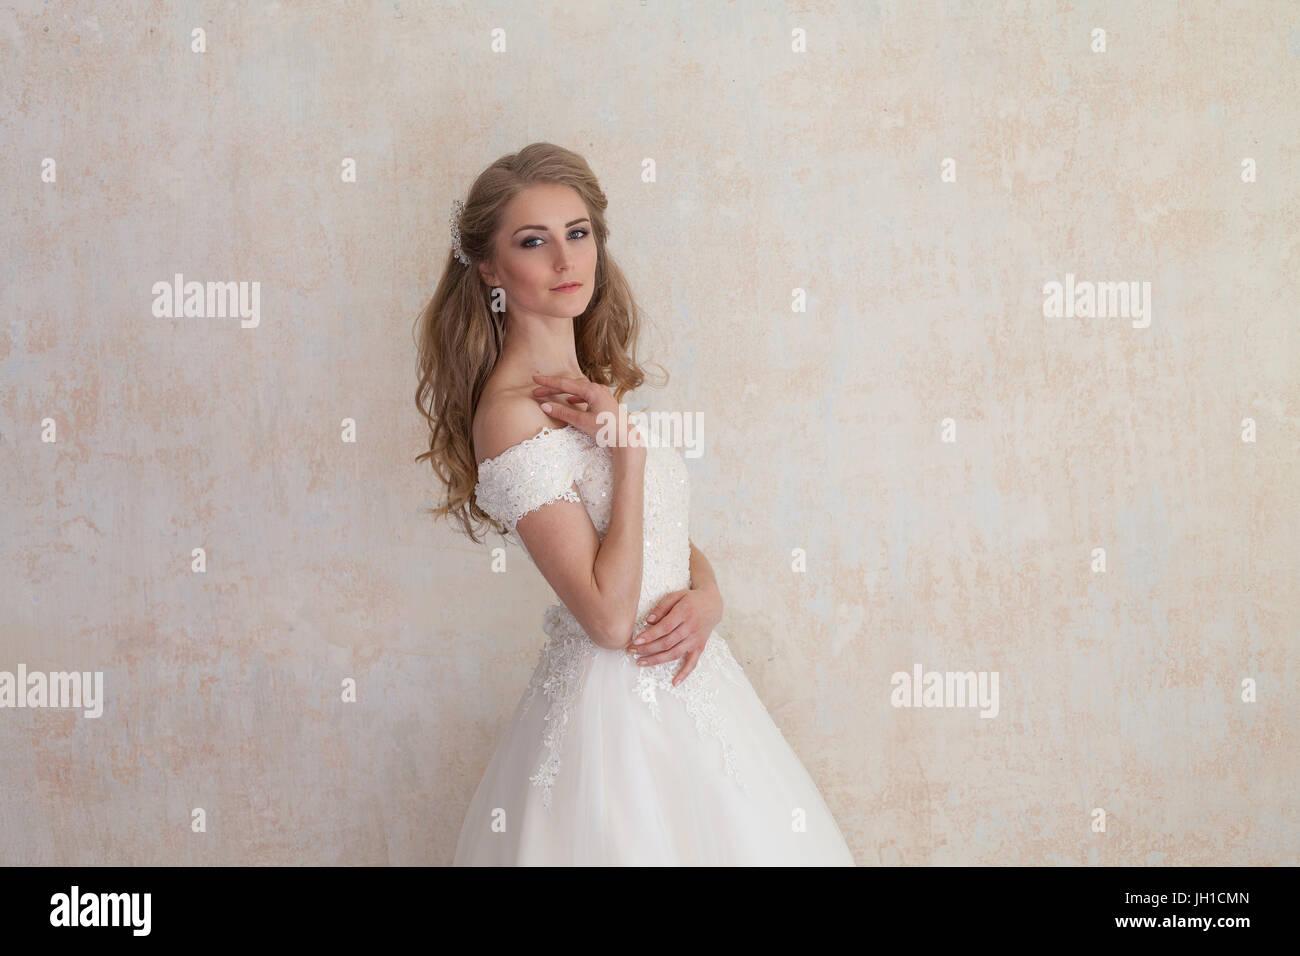 Wedding Dress And Hanger Stockfotos & Wedding Dress And Hanger ...